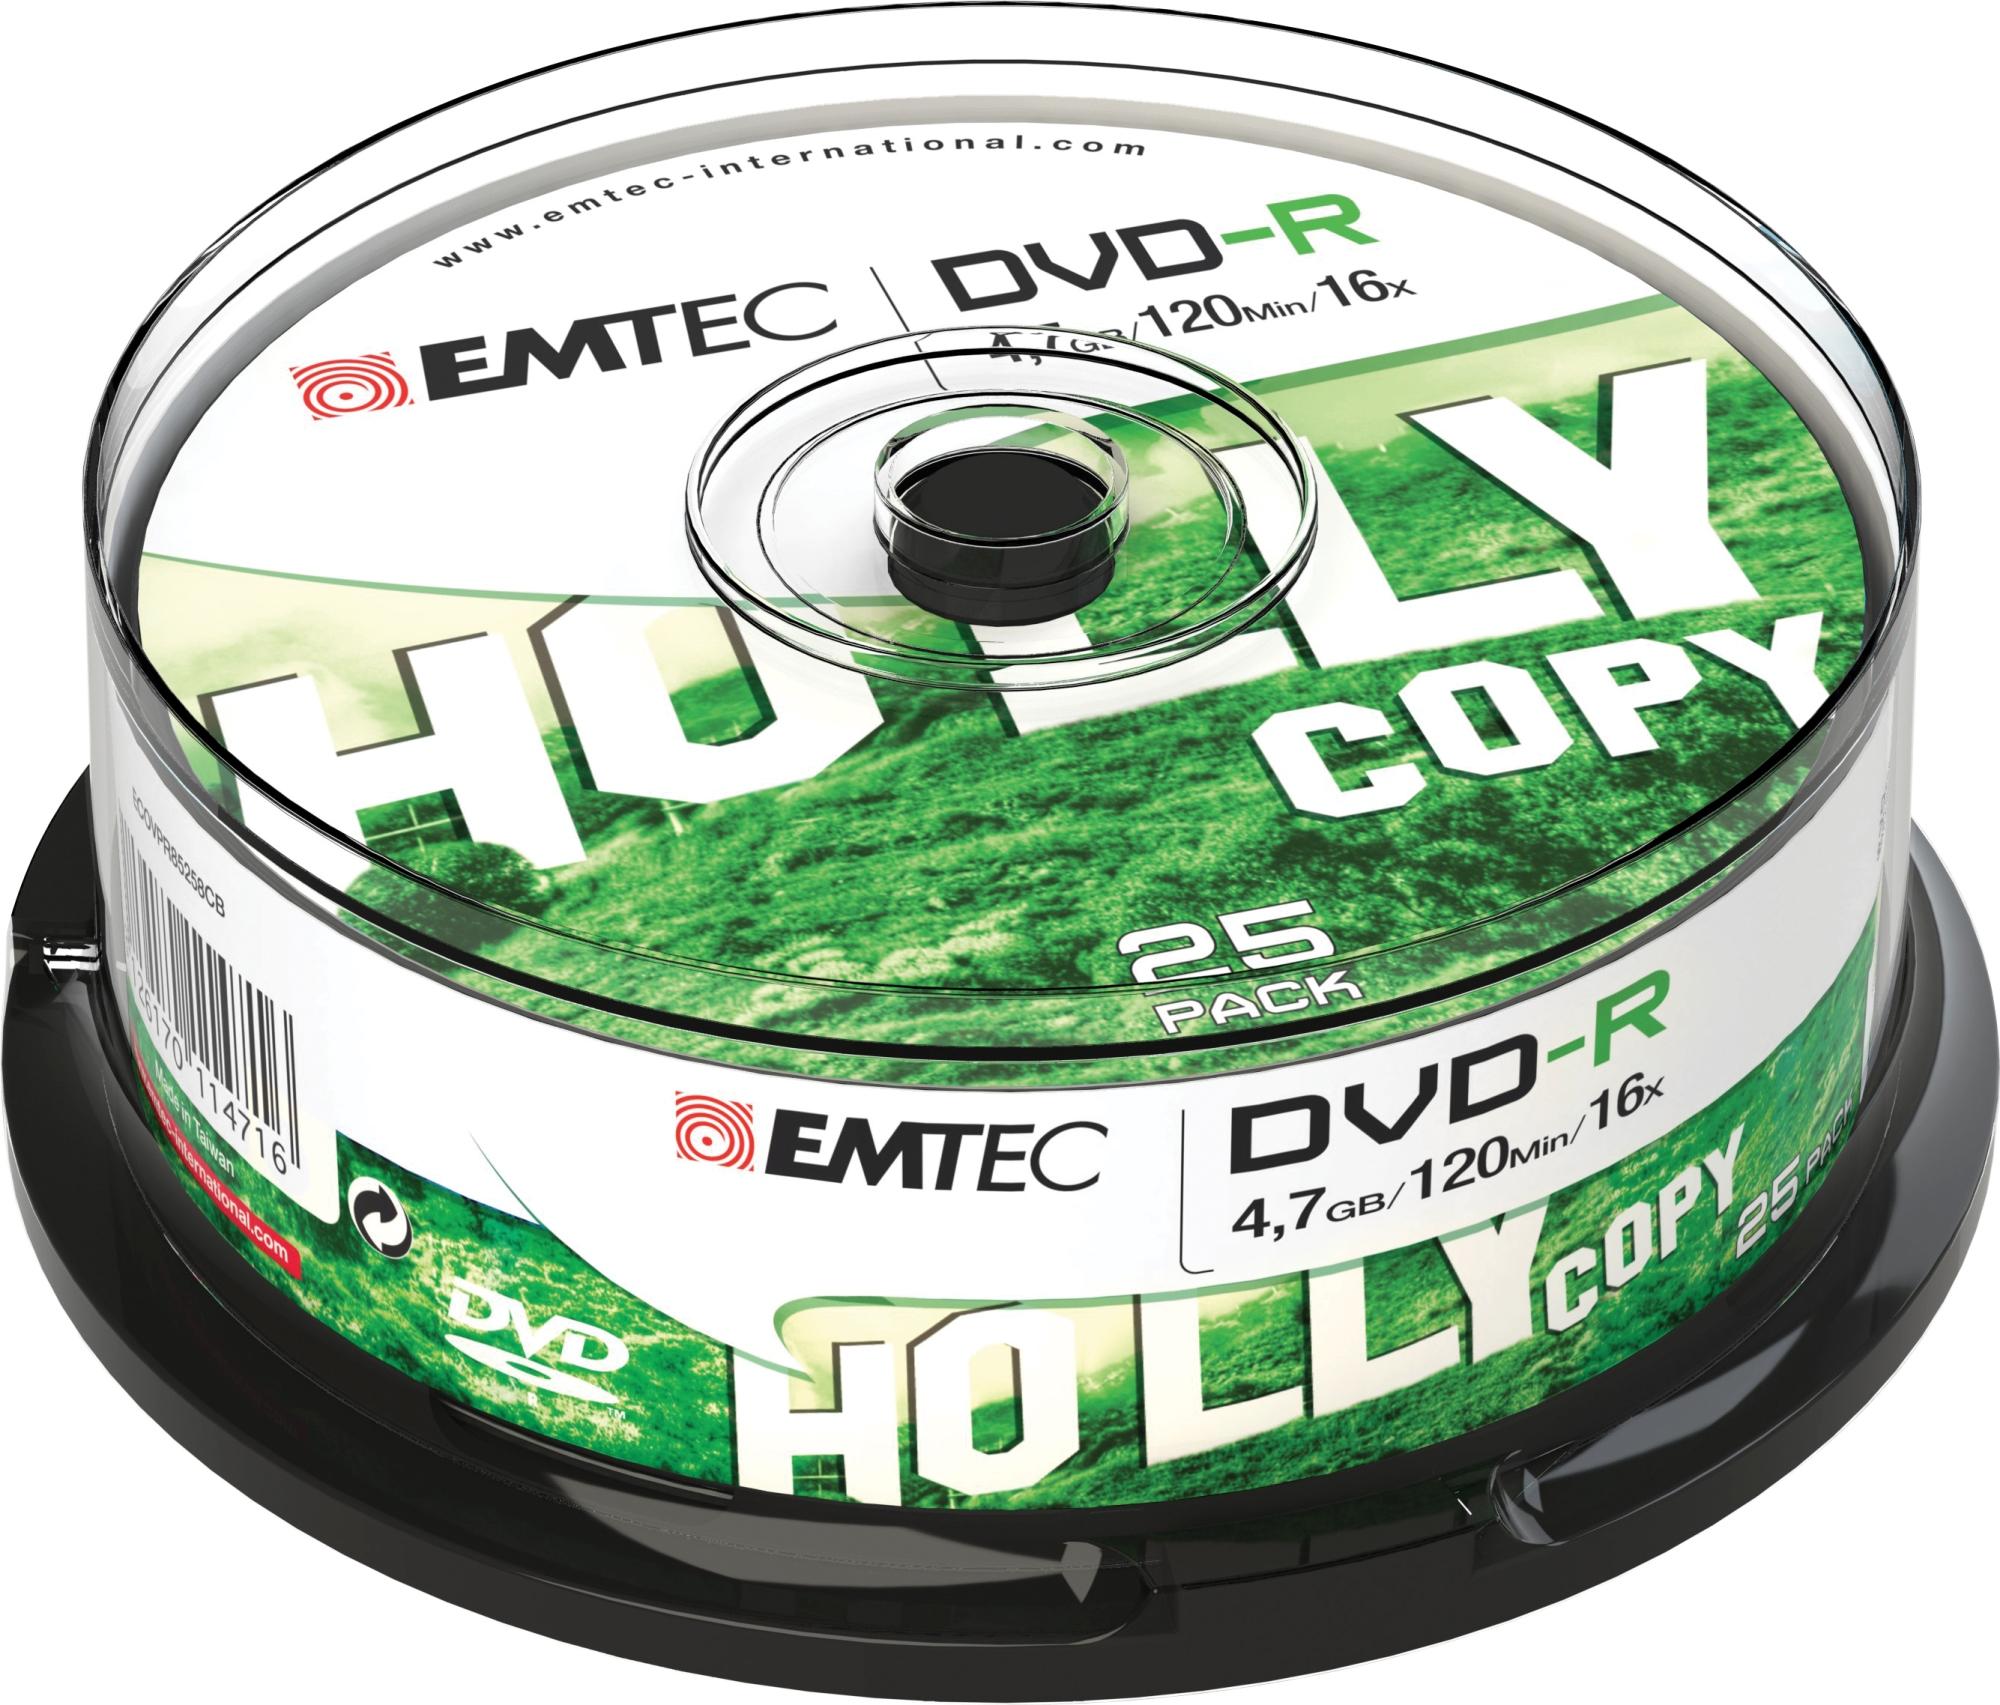 ECOVR472516CB 4.7GB DVD-R 25PIEZA(S) DVD EN BLANCO CD/DVD/DISQUETES VÍRGENES